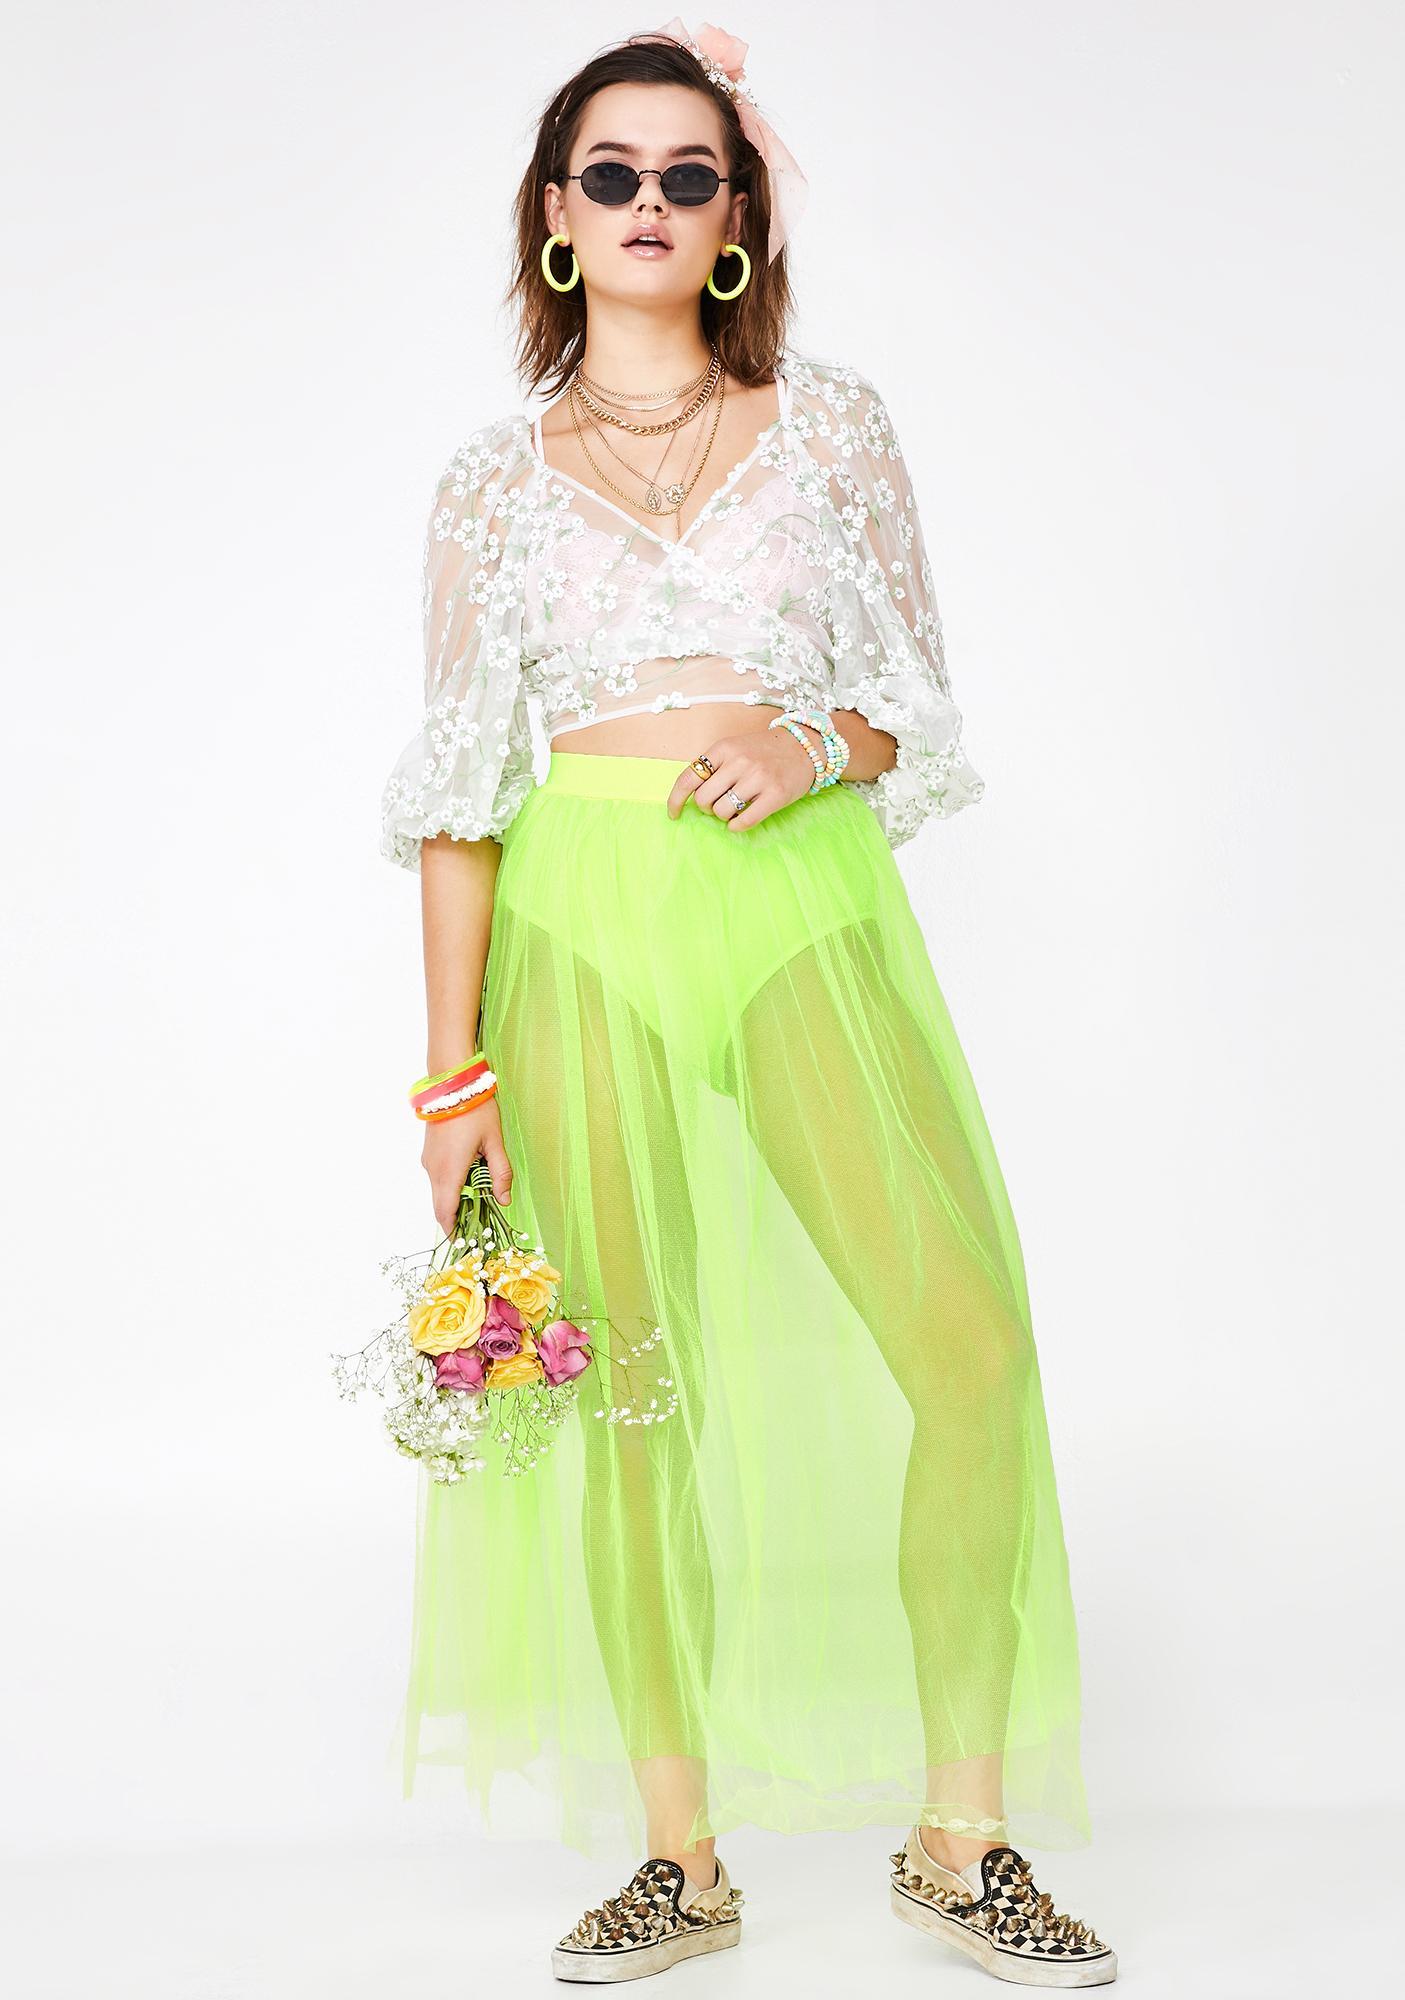 c41fb90c4 Neon Green Sheer Tulle Maxi Skirt | Dolls Kill